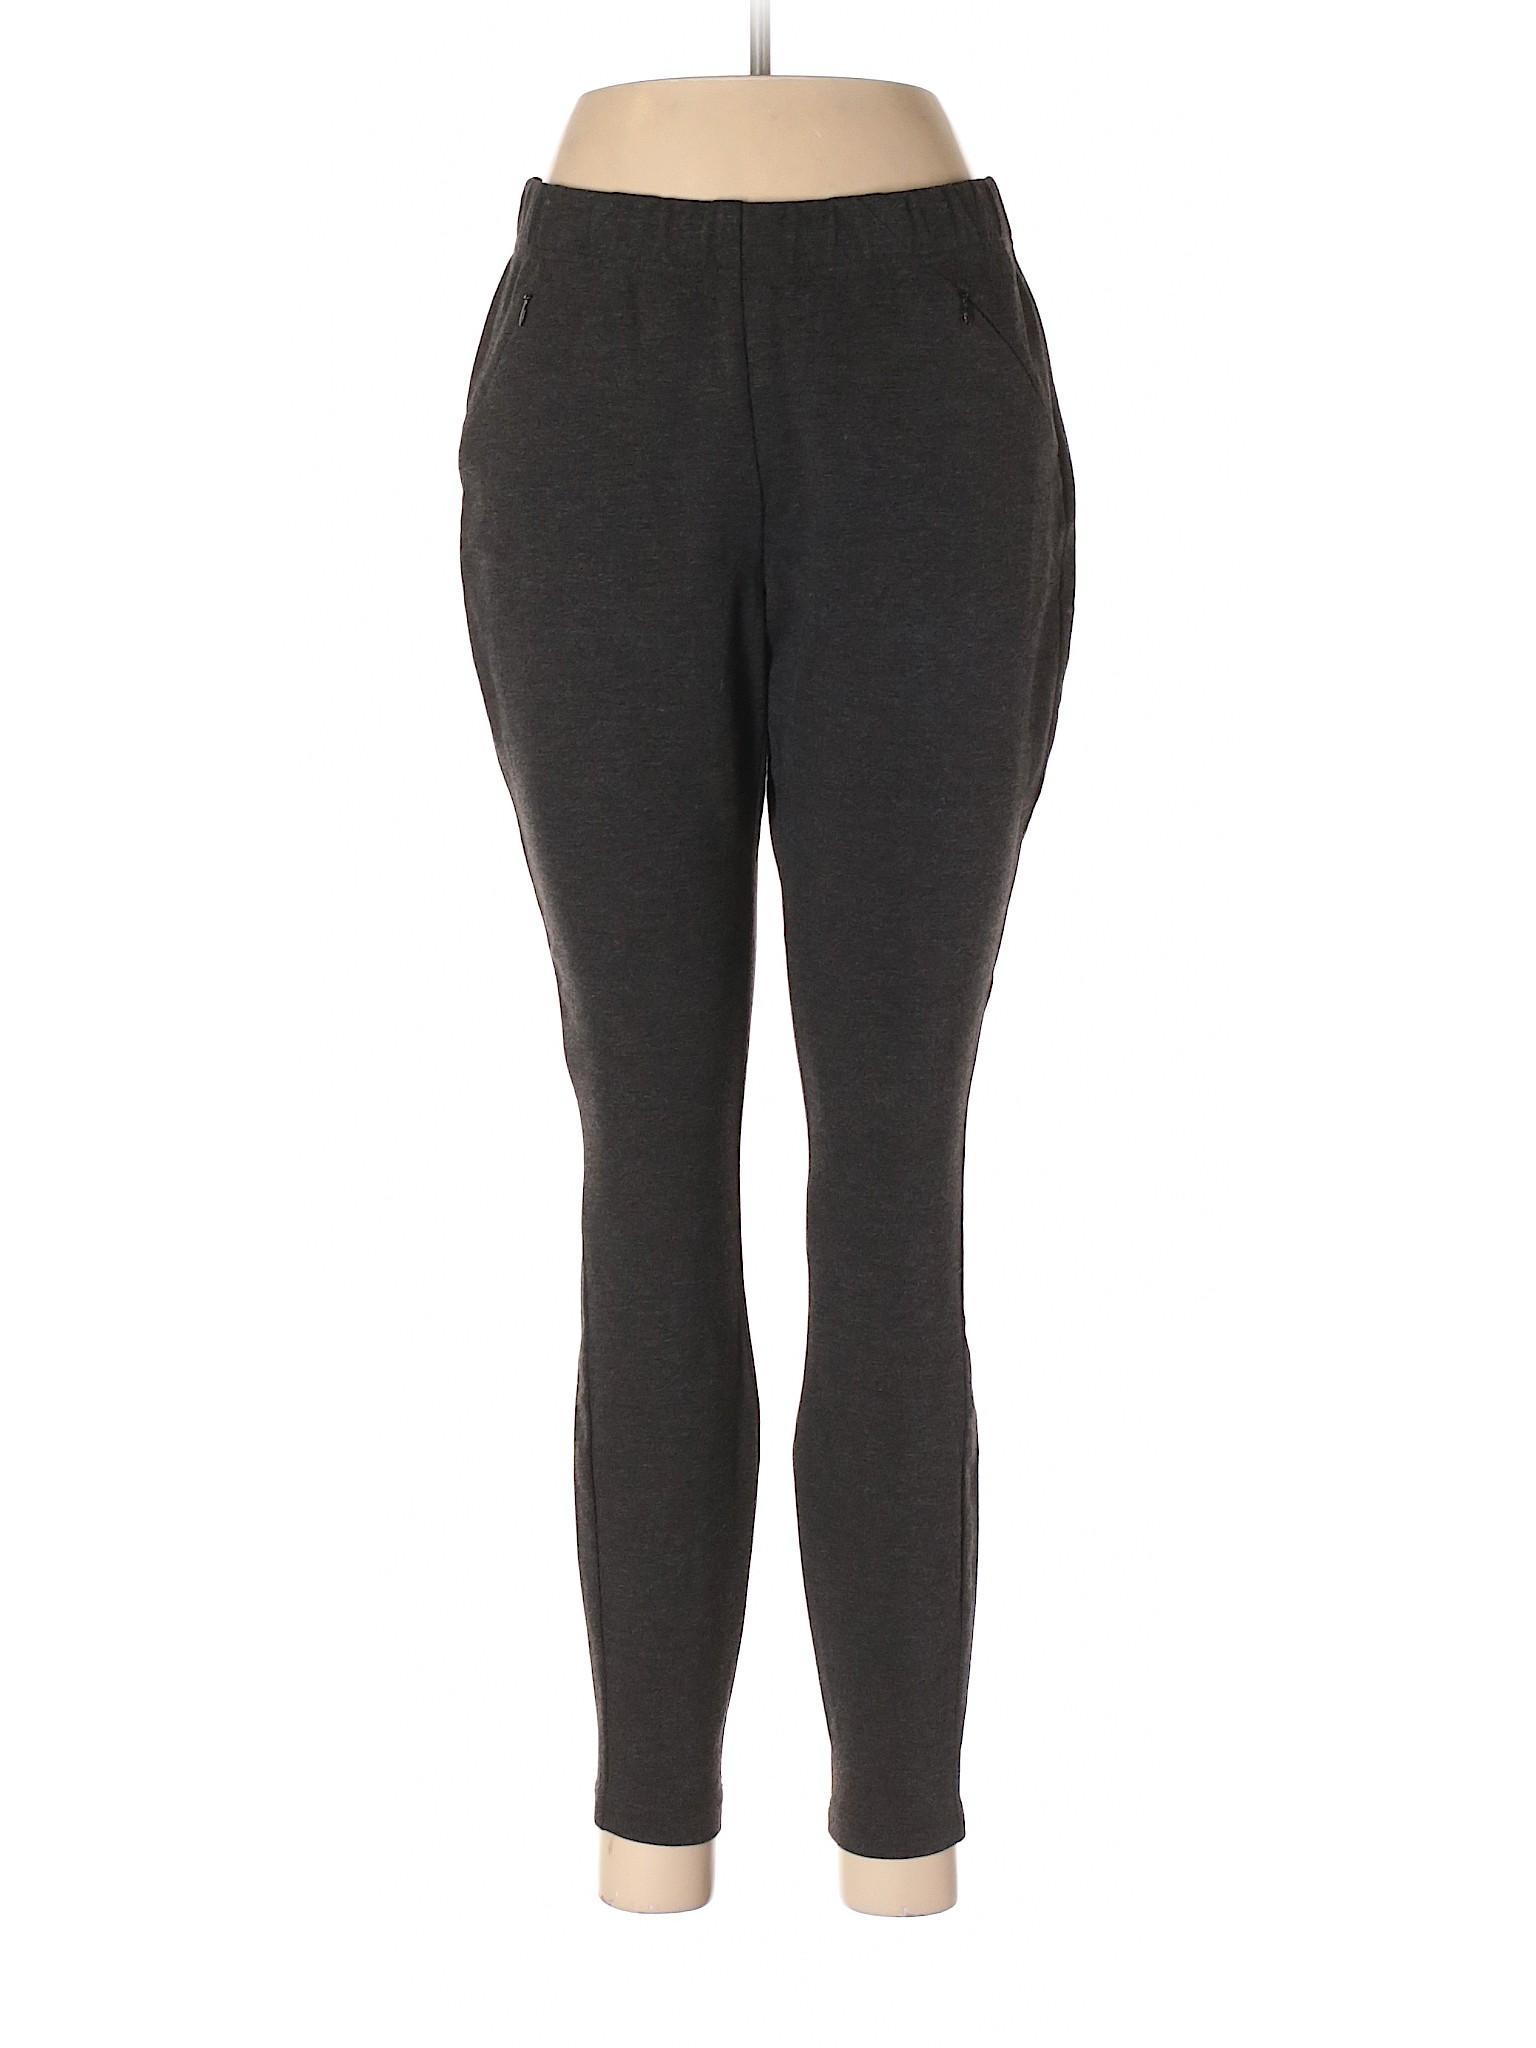 Casual jill winter J Pants Boutique 6BnpPWWq